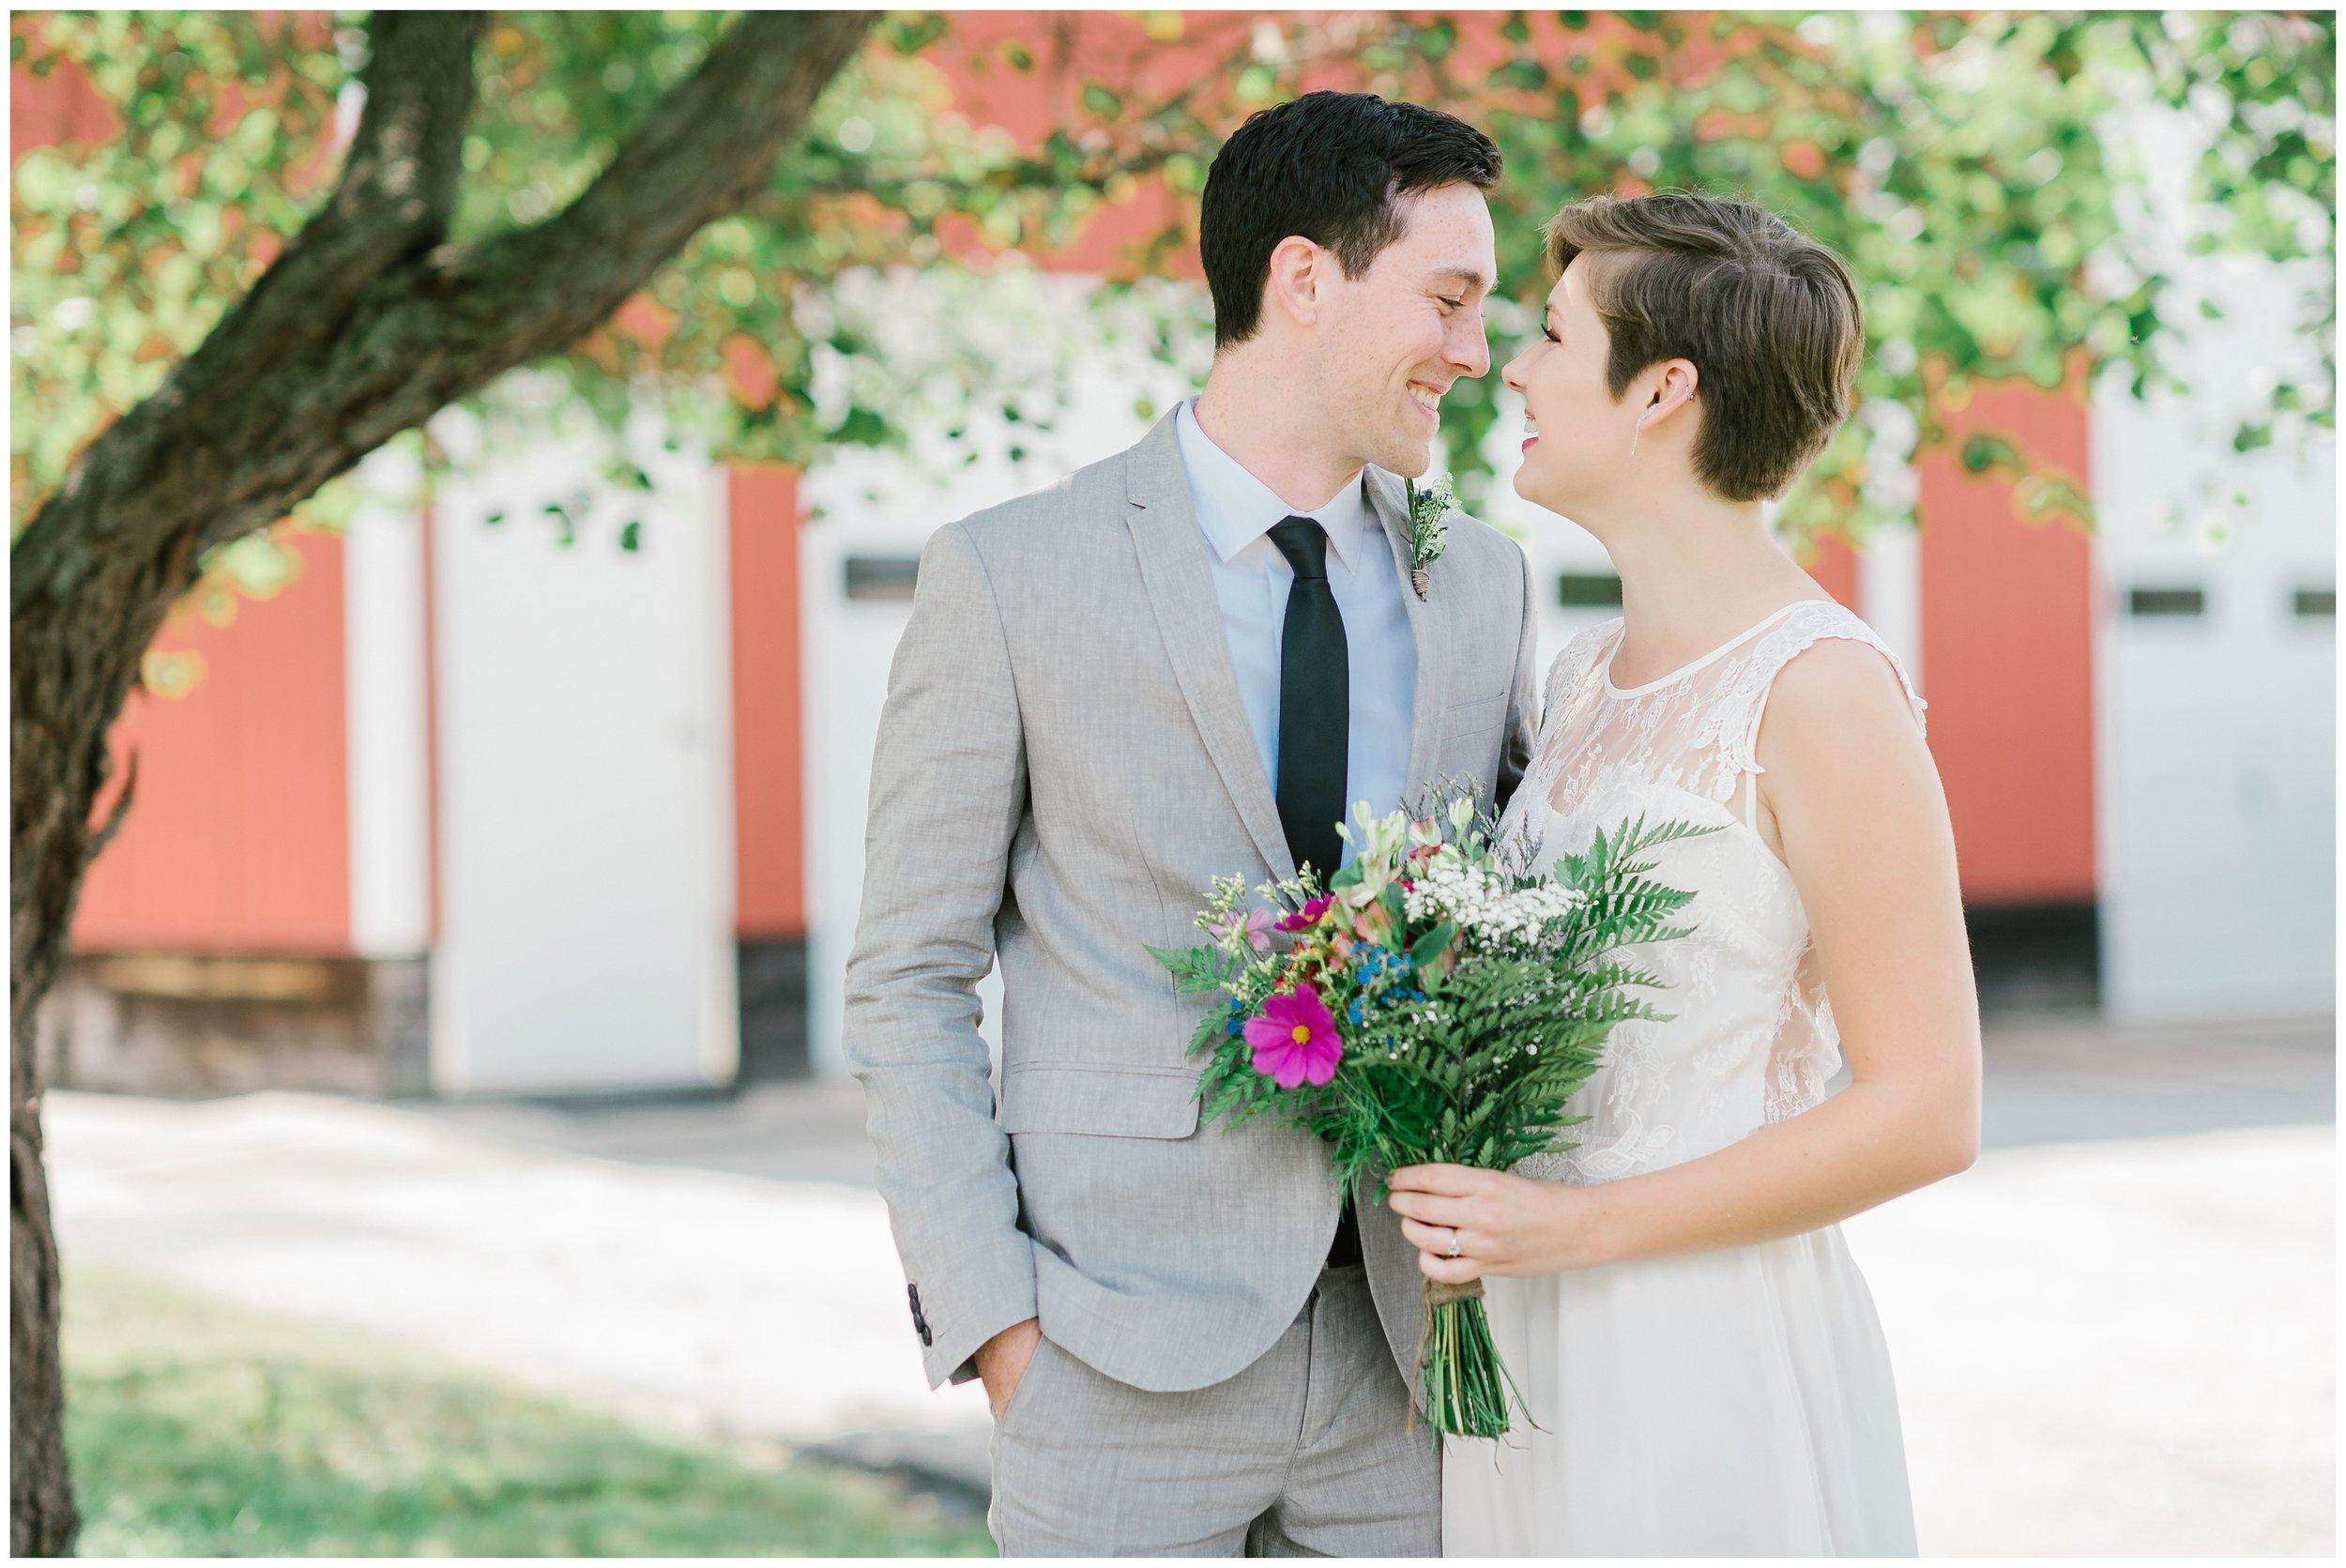 Rebecca_Shehorn_Photography_Indianapolis_Wedding_Photographer_7219.jpg